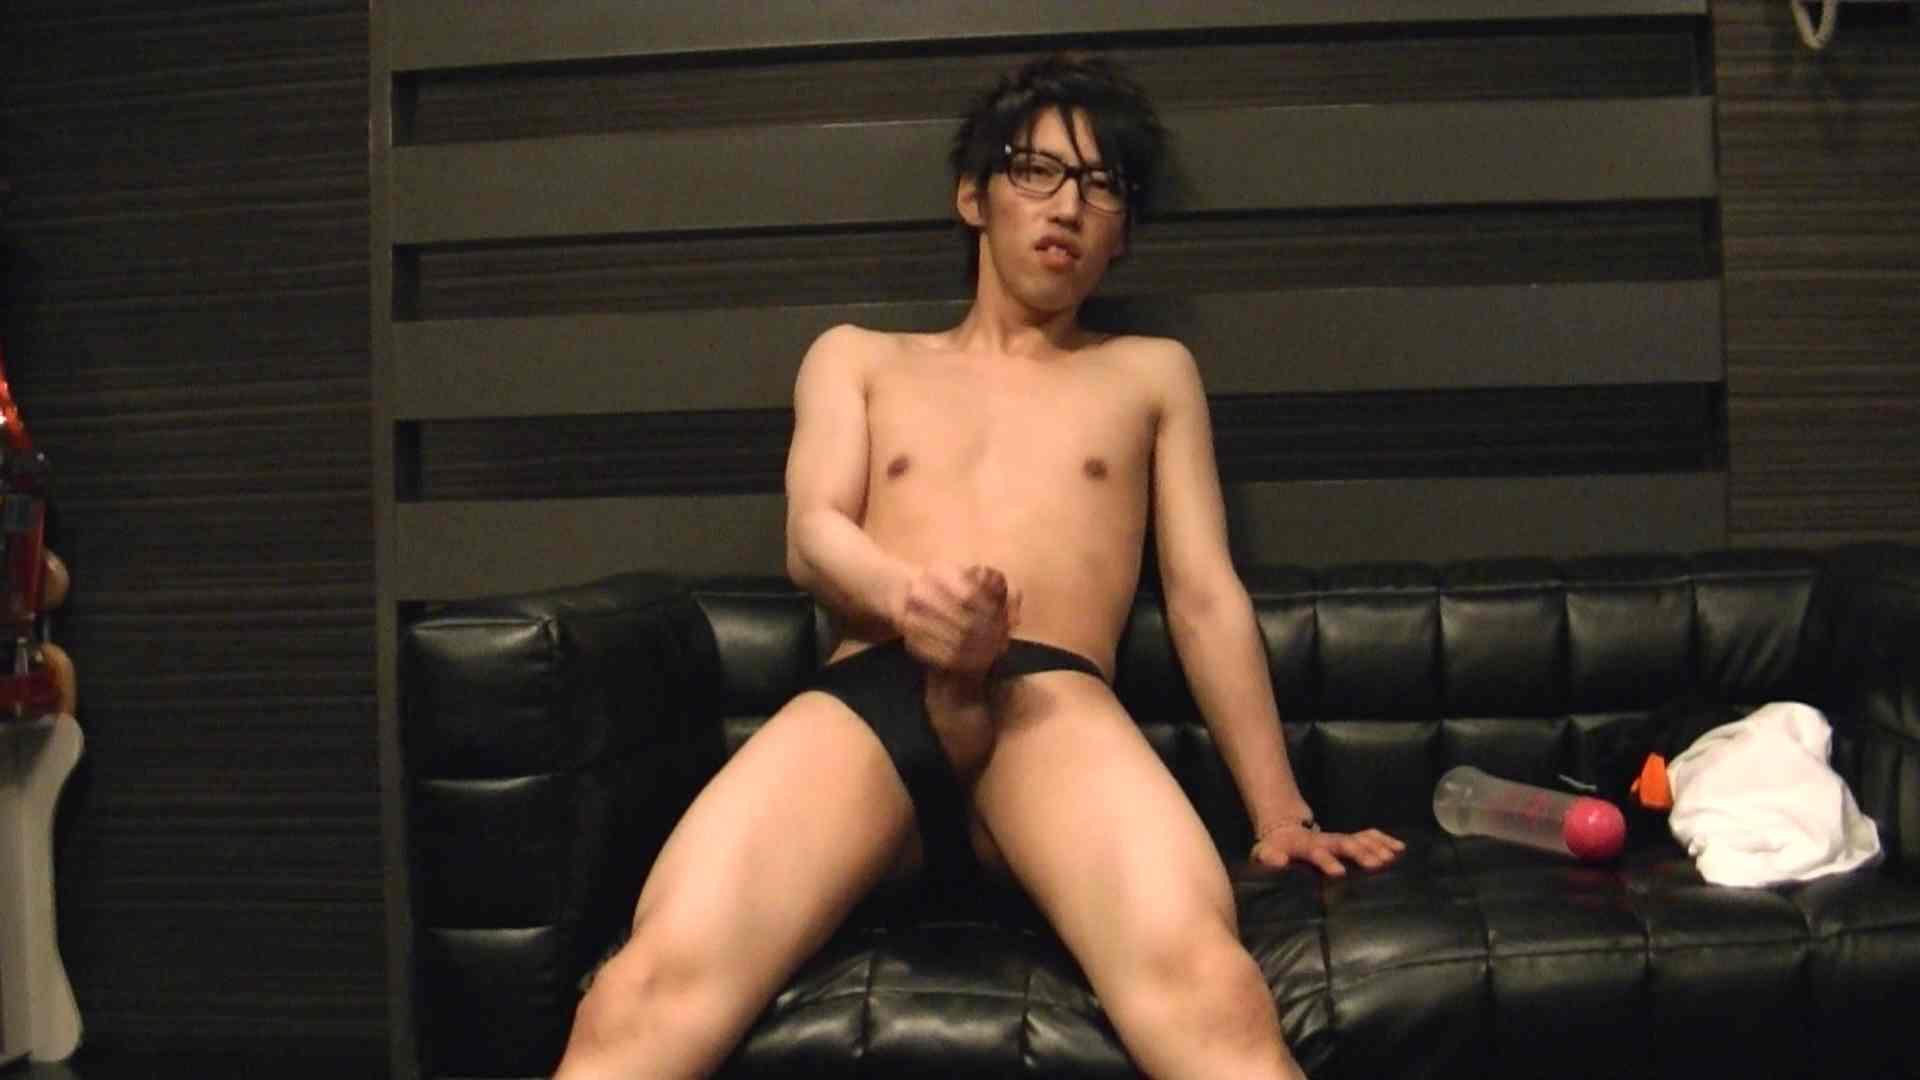 Mr.オナックスさん投稿!HD 貴方のオナニー三万円で撮影させてください。VOL.04 ノンケのオナニー ゲイアダルト画像 55連発 52